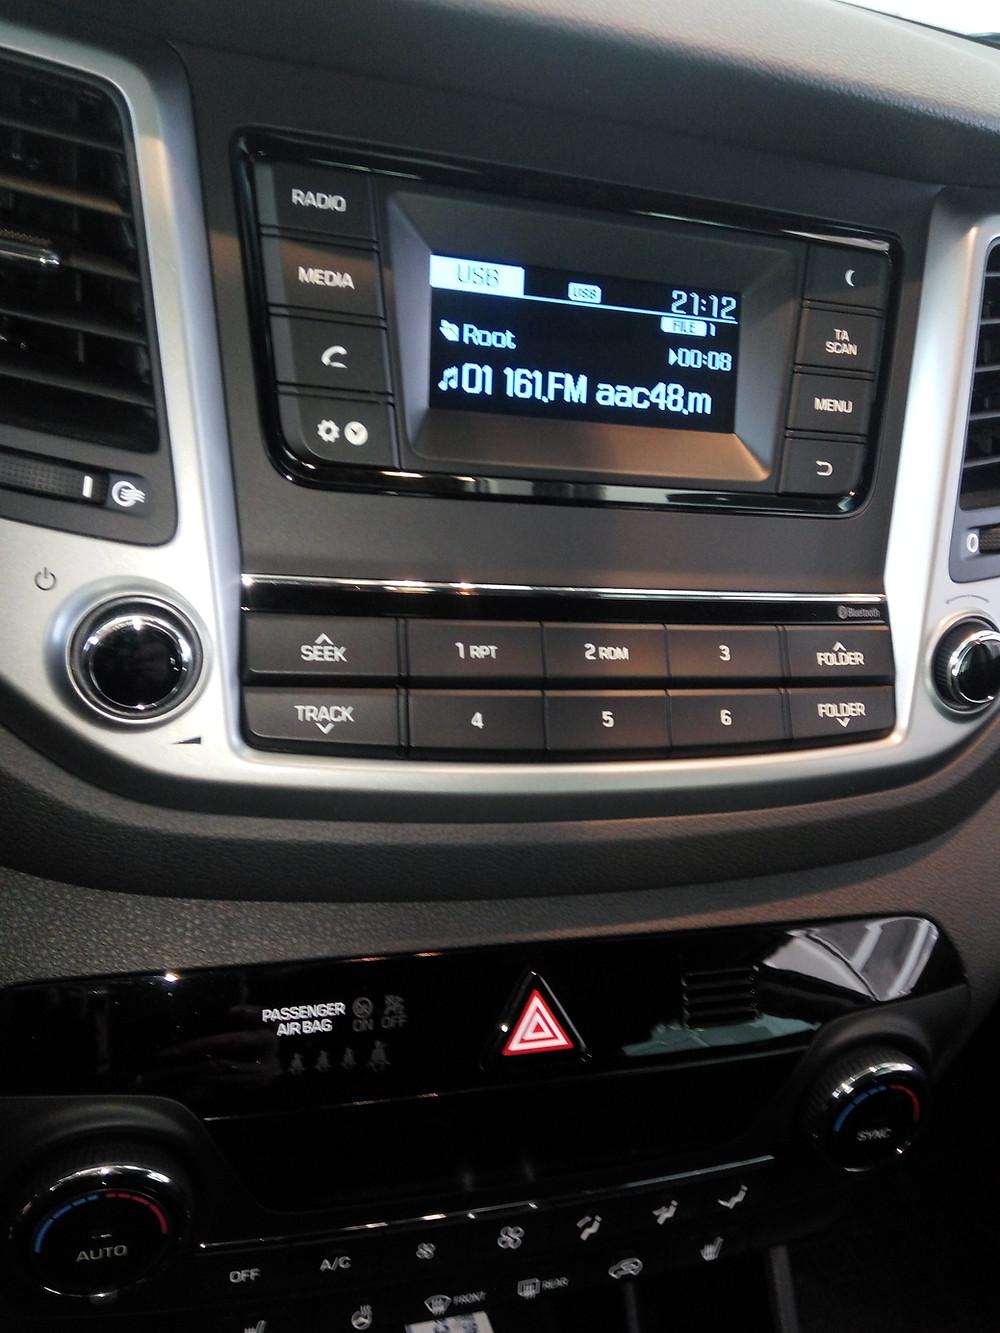 Tucson & iCarRadio